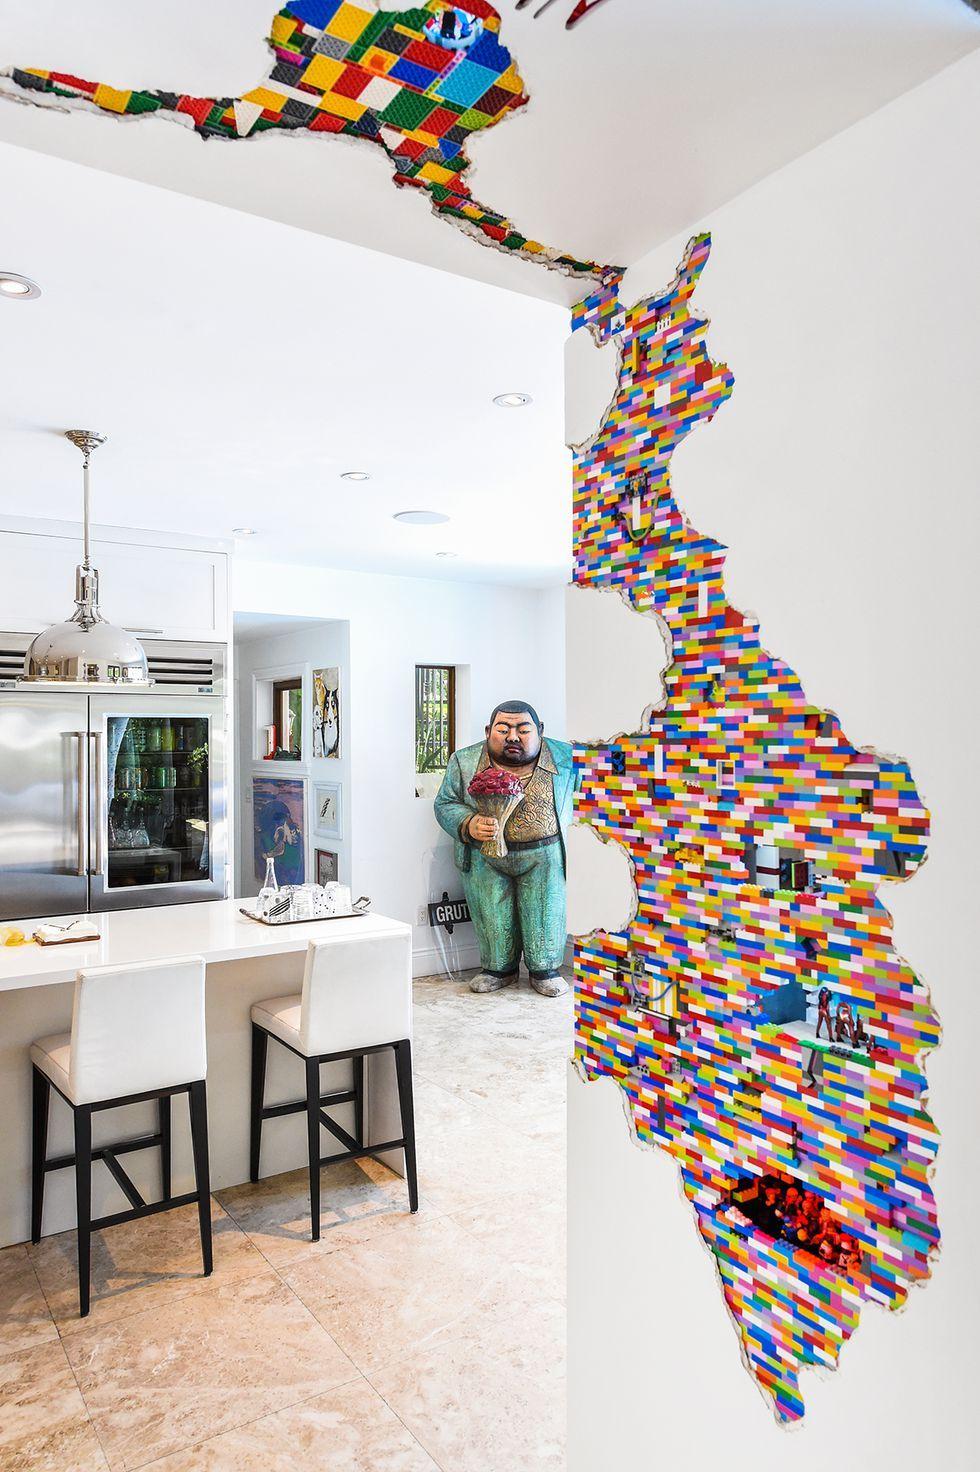 At Home With Miami Based Hospitality Entrepreneur David Grutman